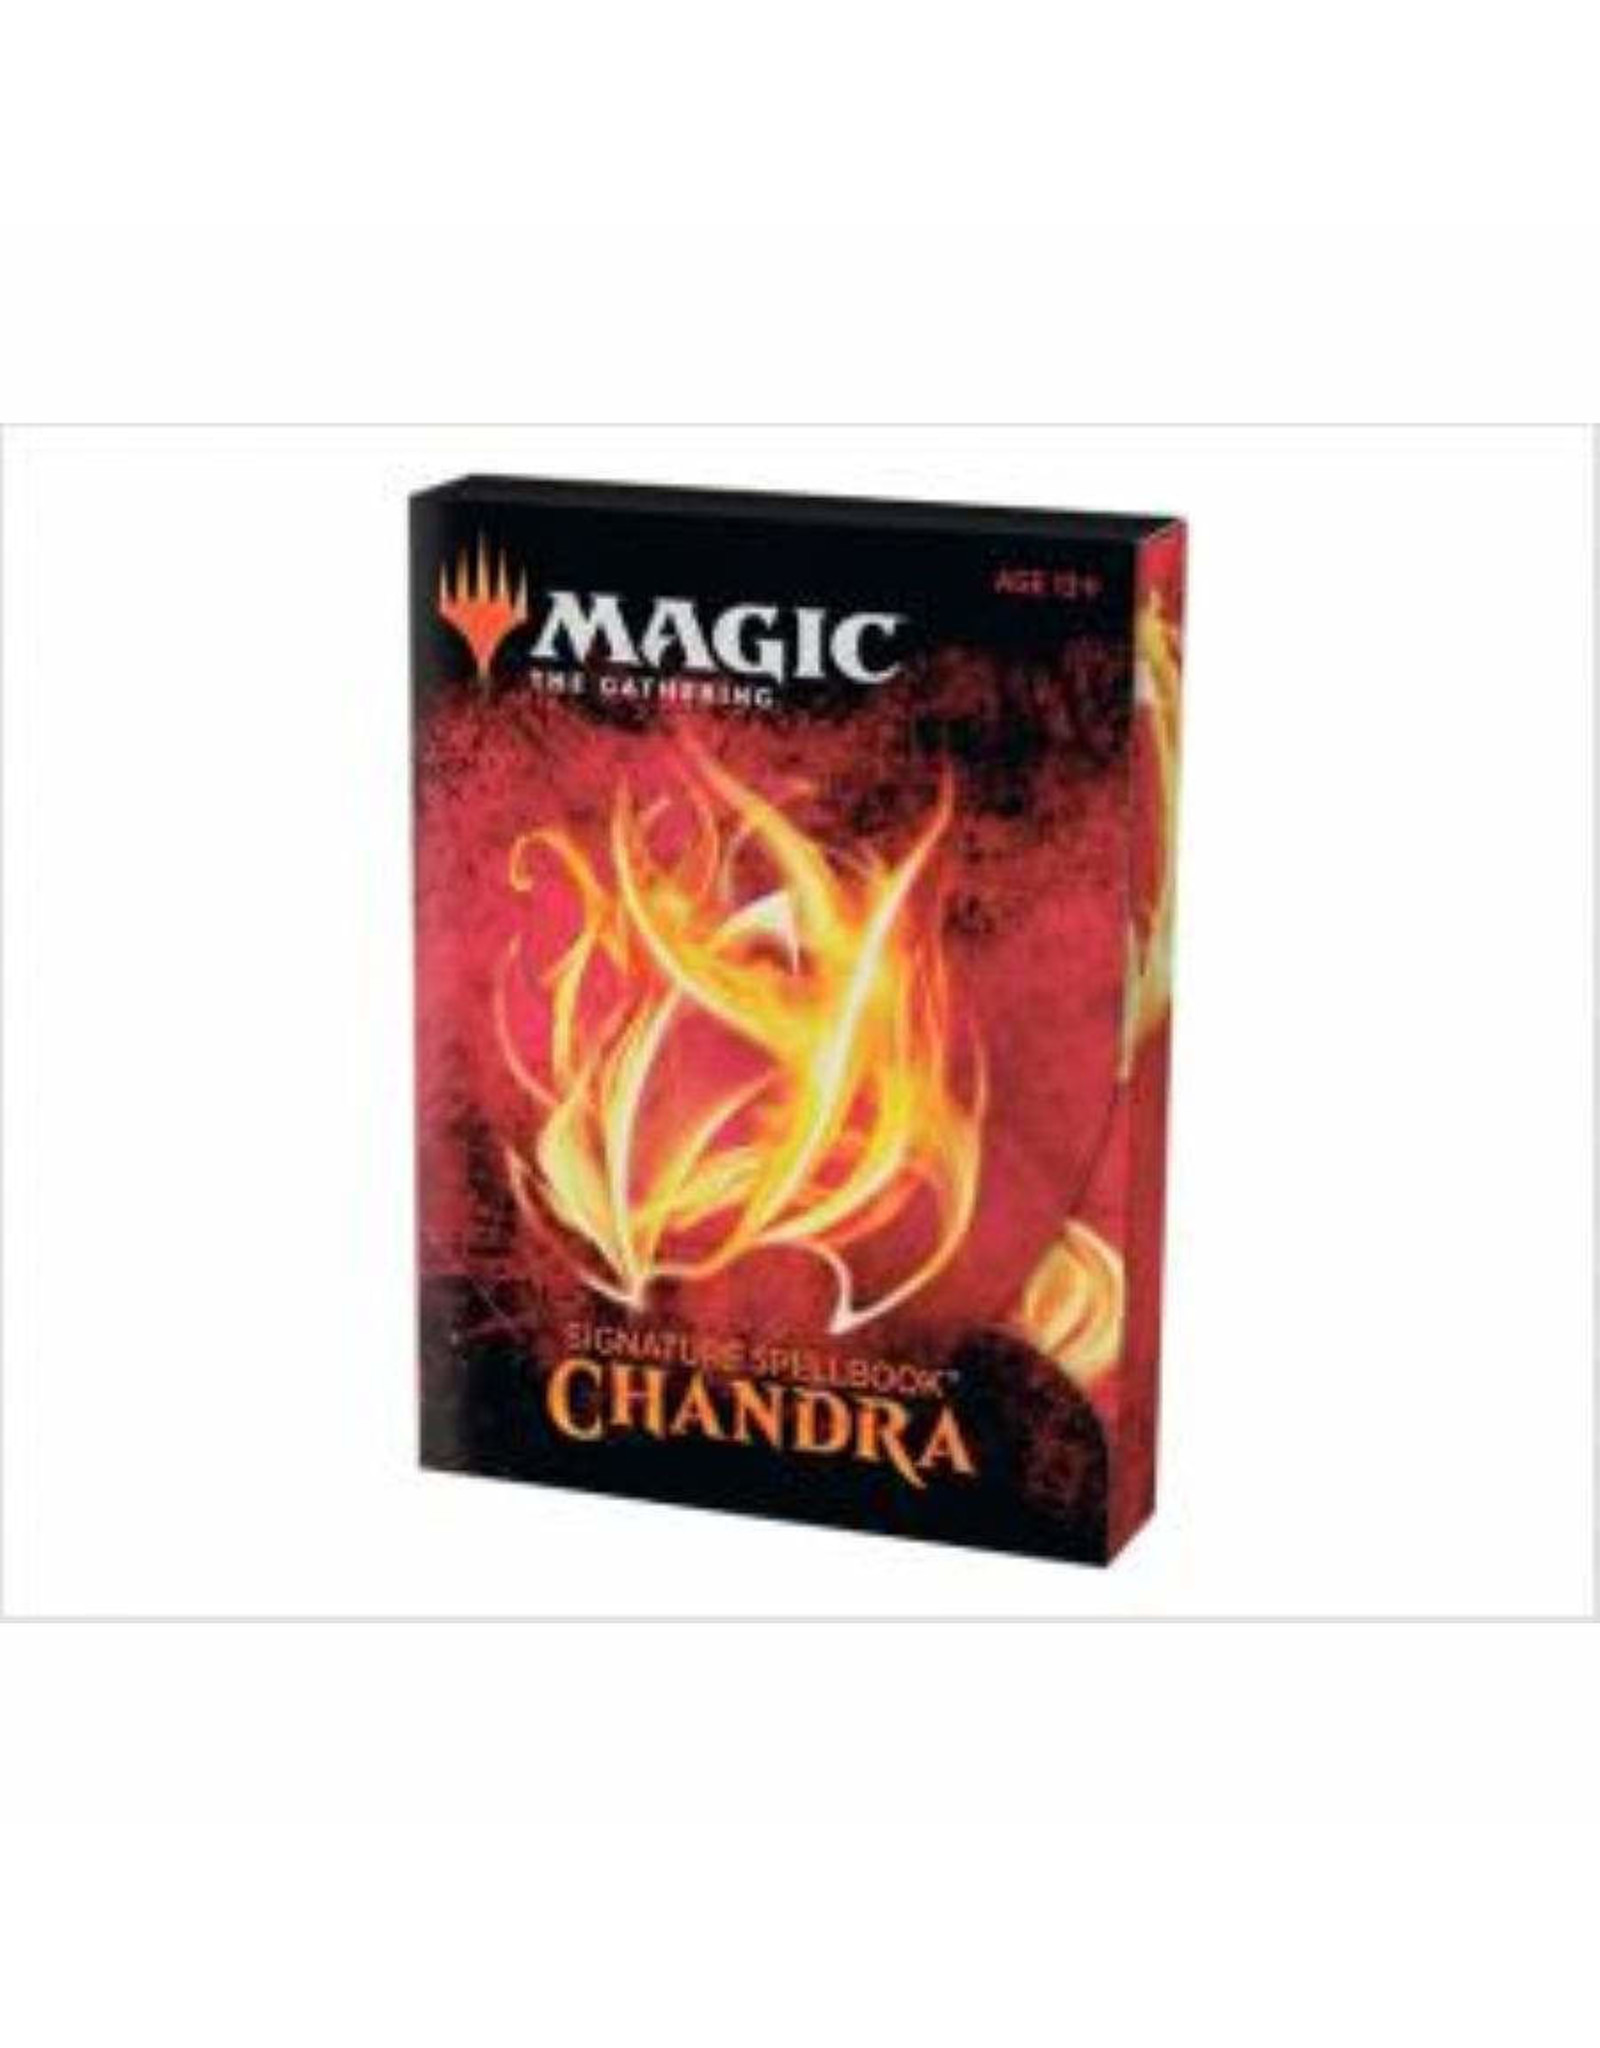 Magic Magic the Gathering: Signature Spellbook Chandra